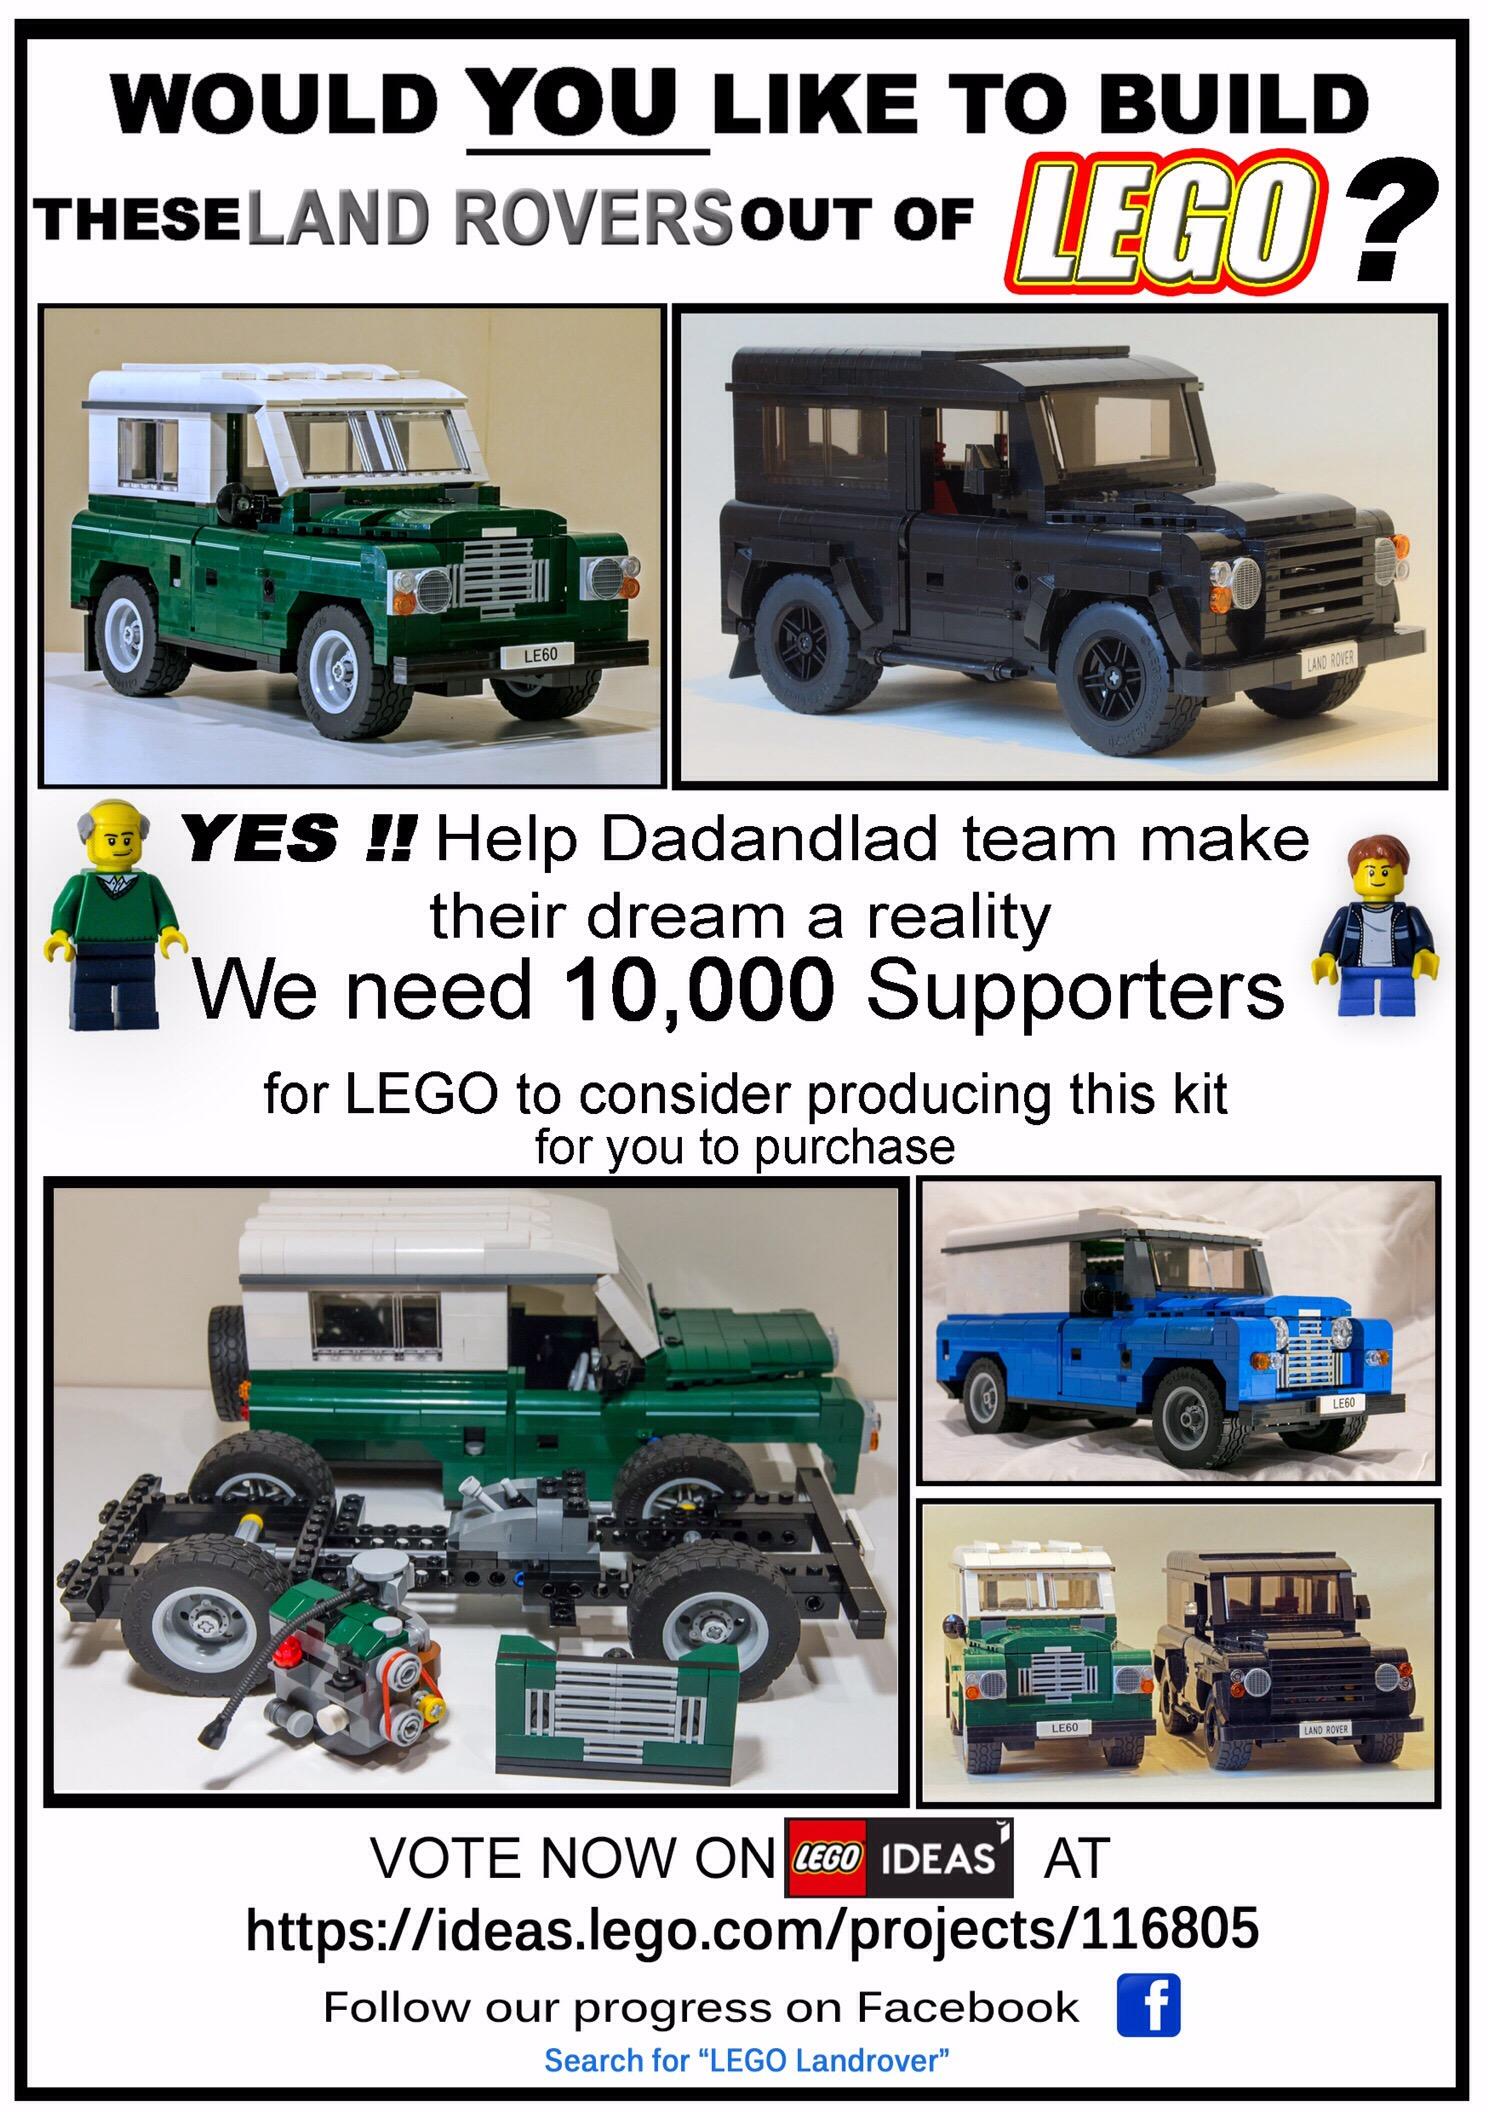 Legolandrover